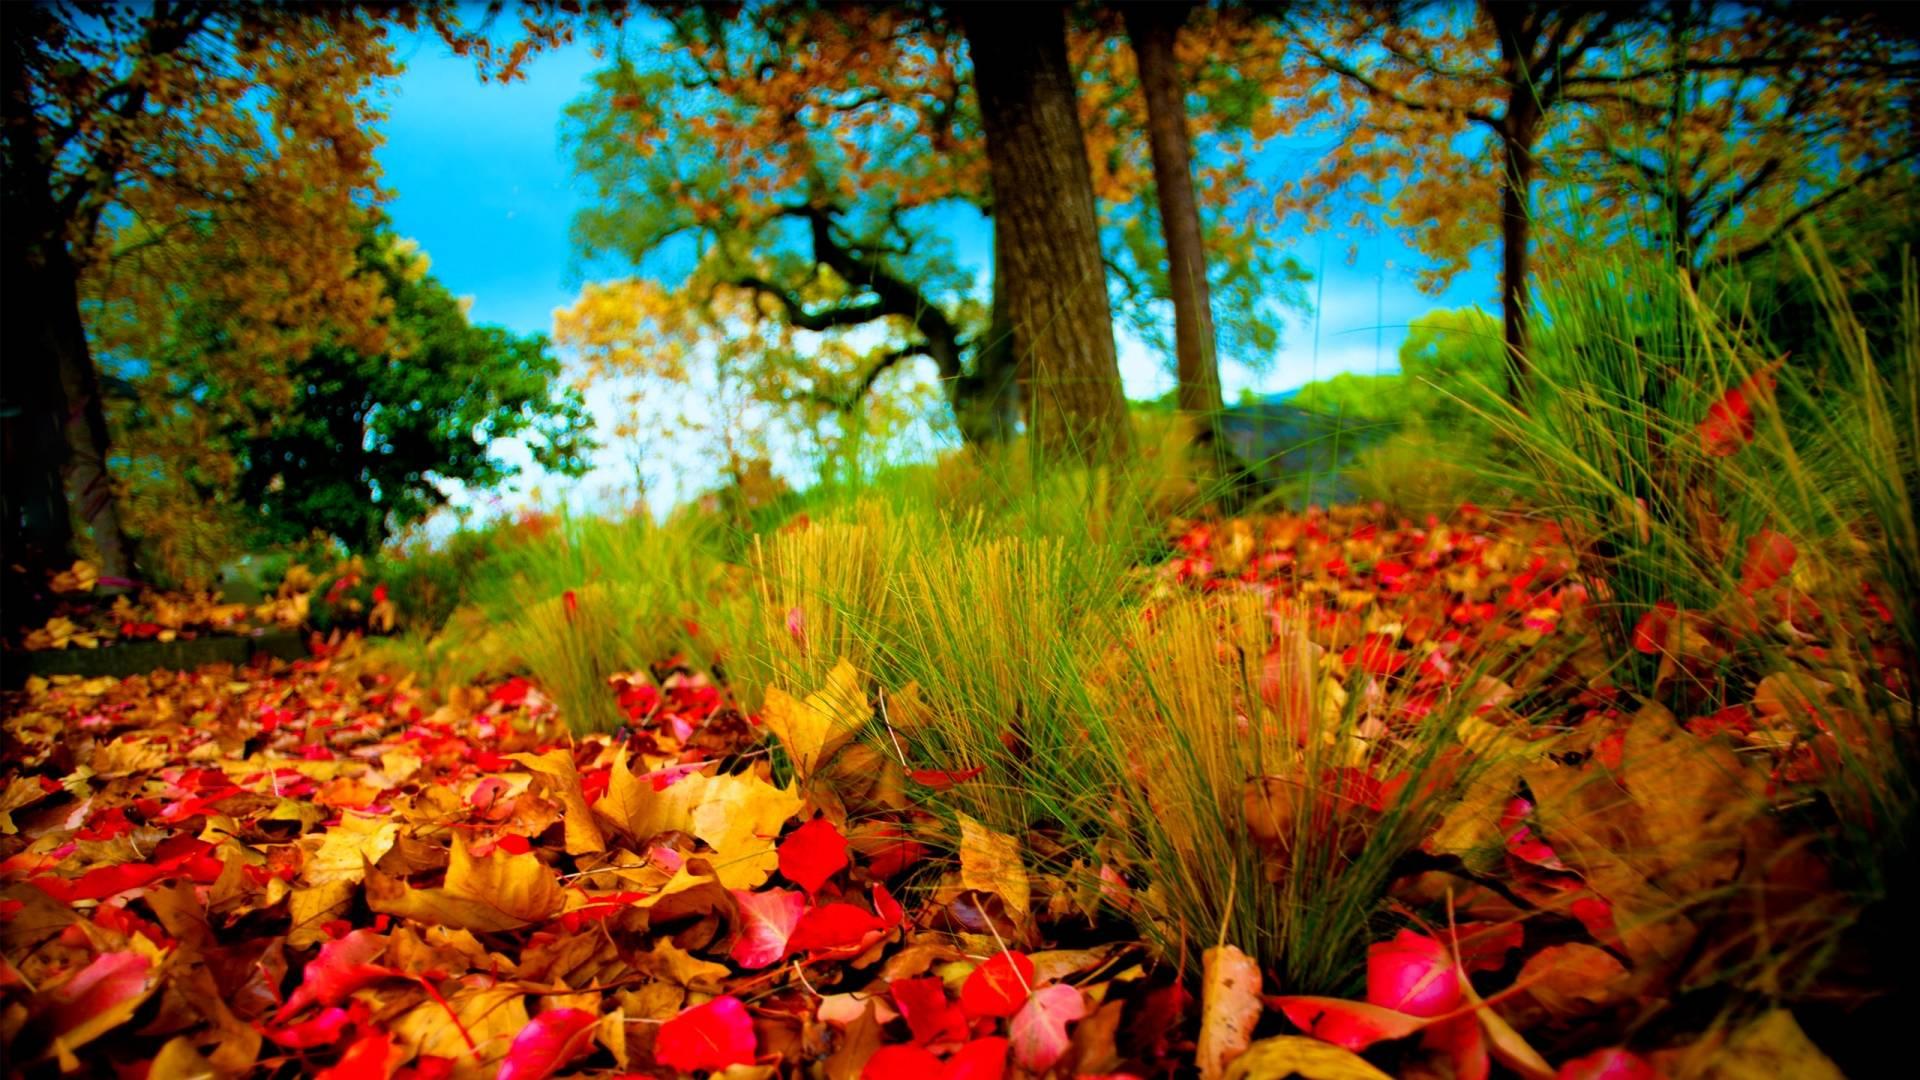 3D HD Nature Images Download 1920x1080